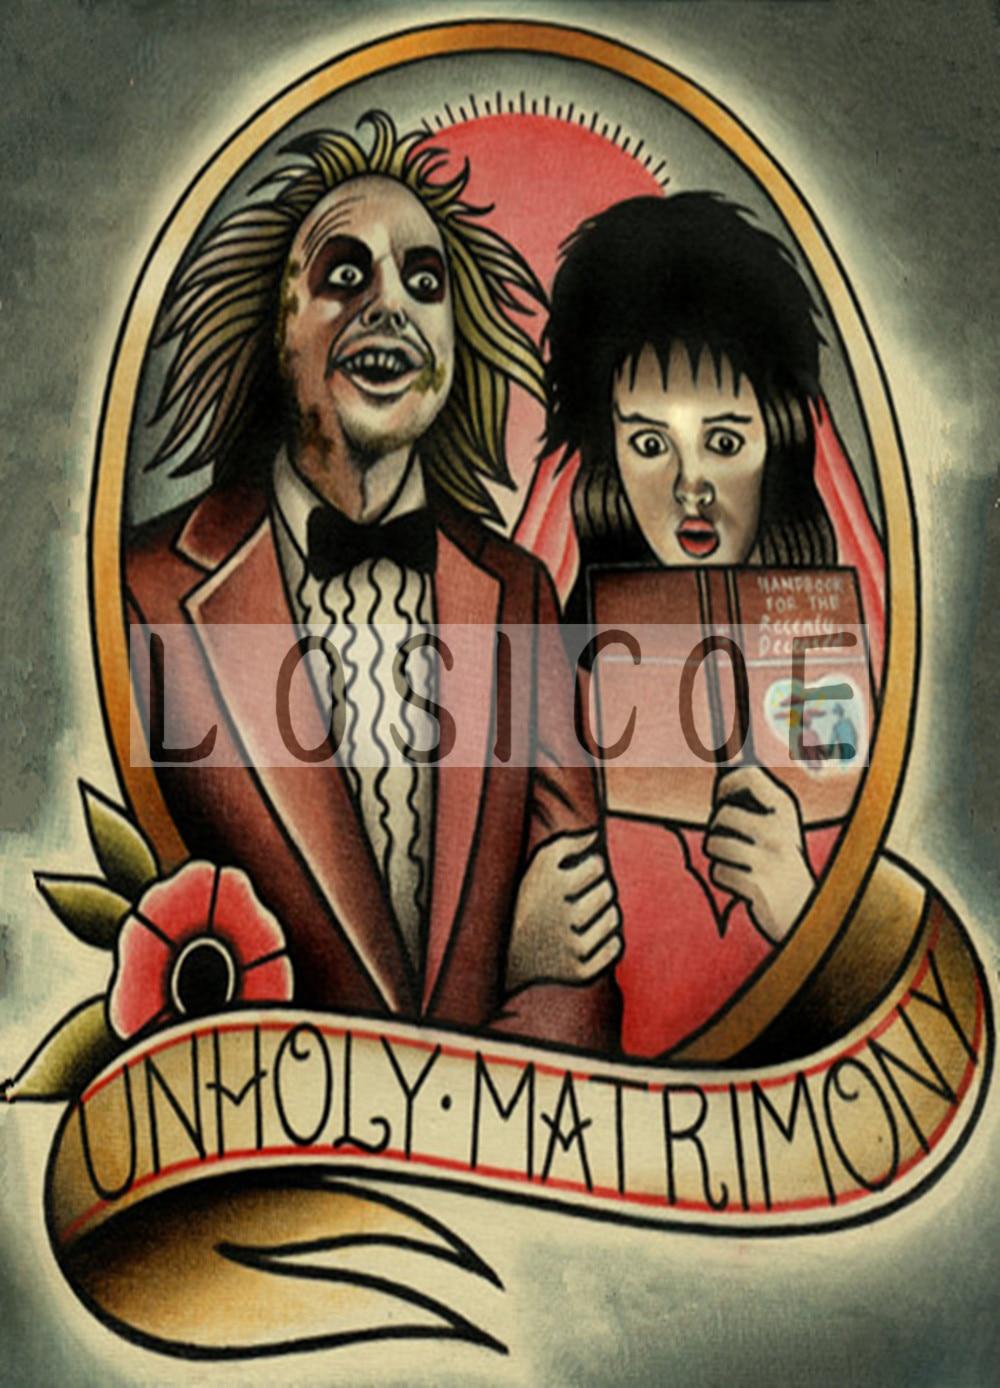 UNHOLY MATRIMONY vintage tattoos pattern kraft paper poster wall sticker art print painting barber shop decor 30X42 CM